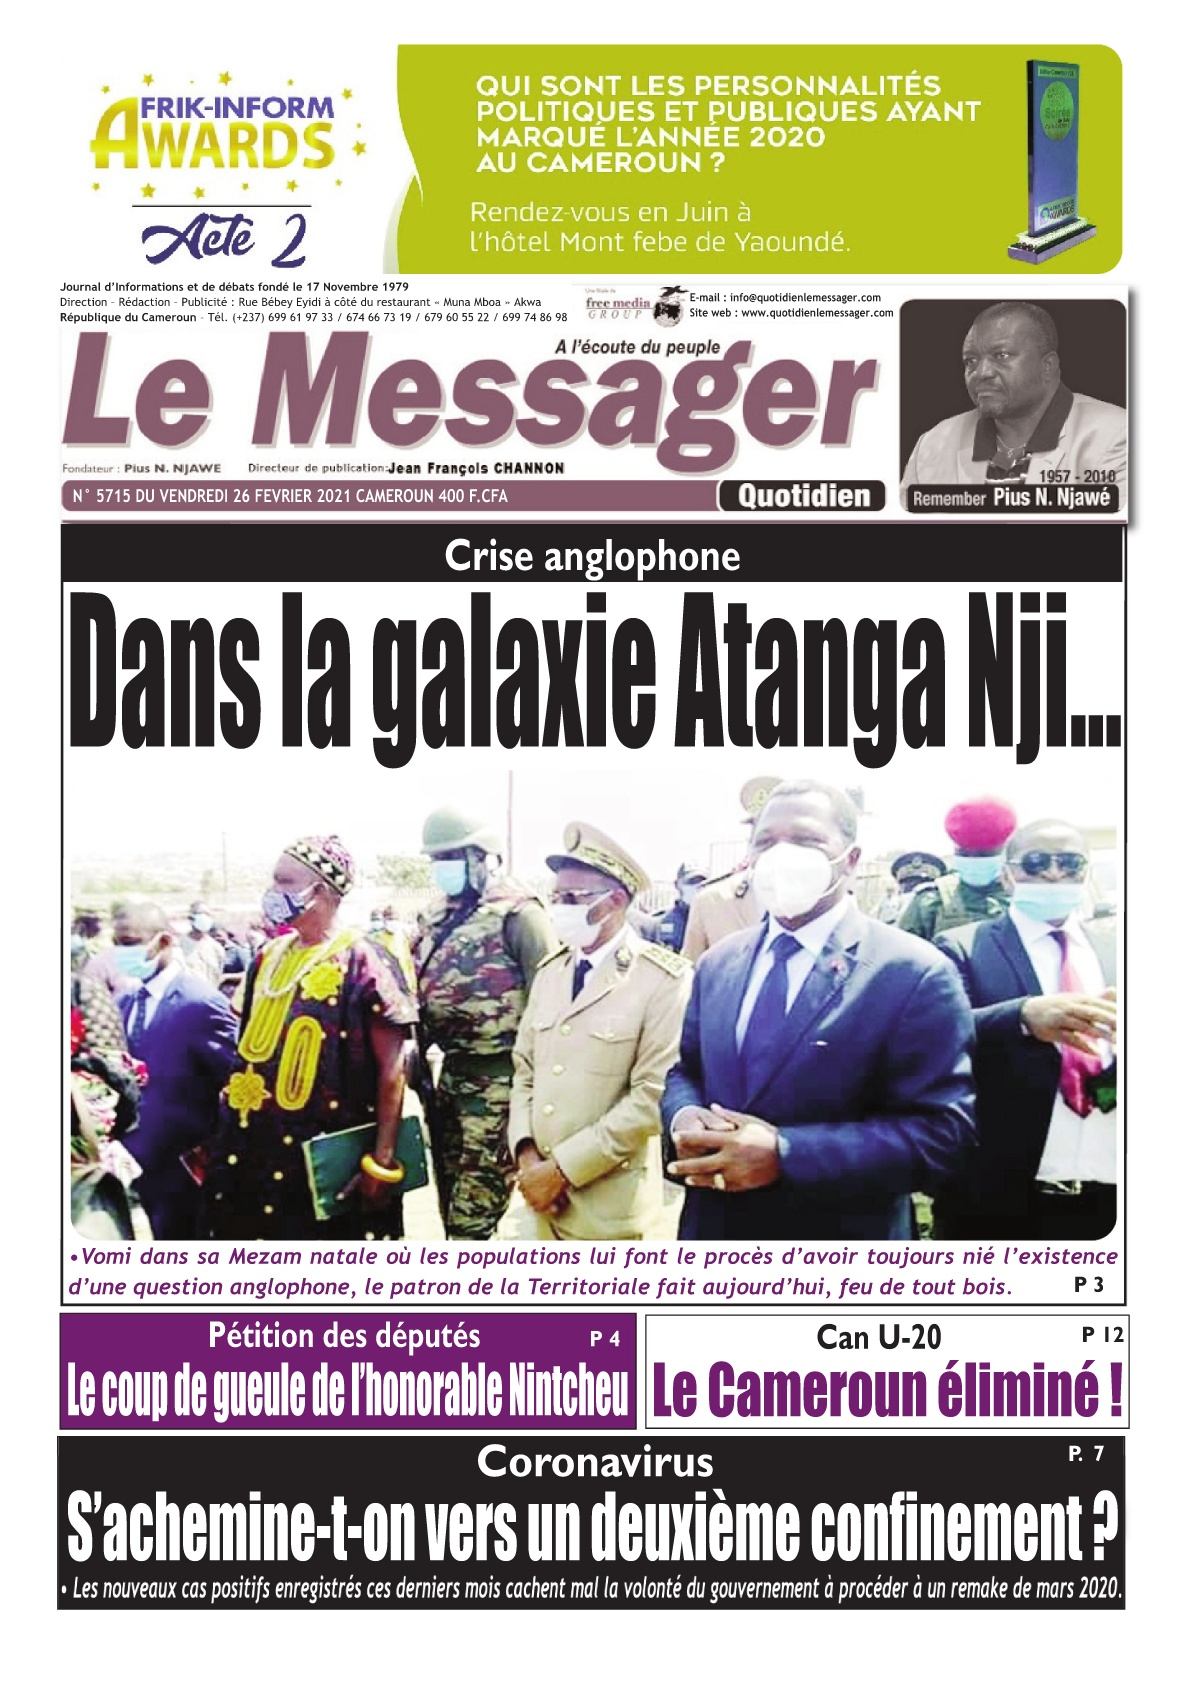 Le Messager - 26/02/2021